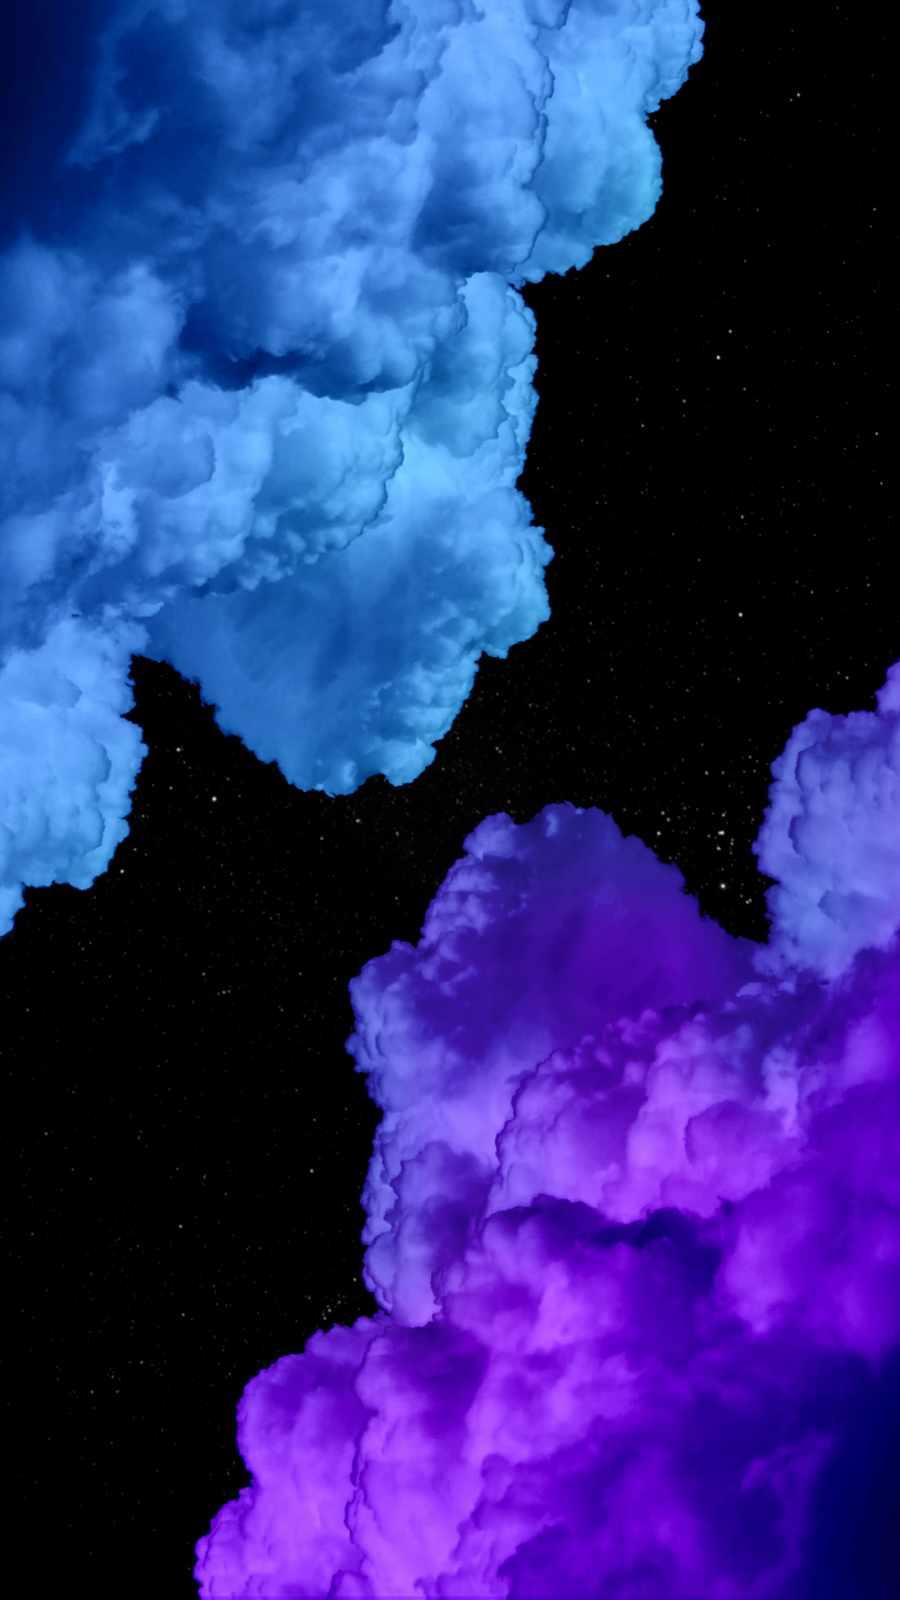 Smoke Clouds iPhone Wallpaper 1